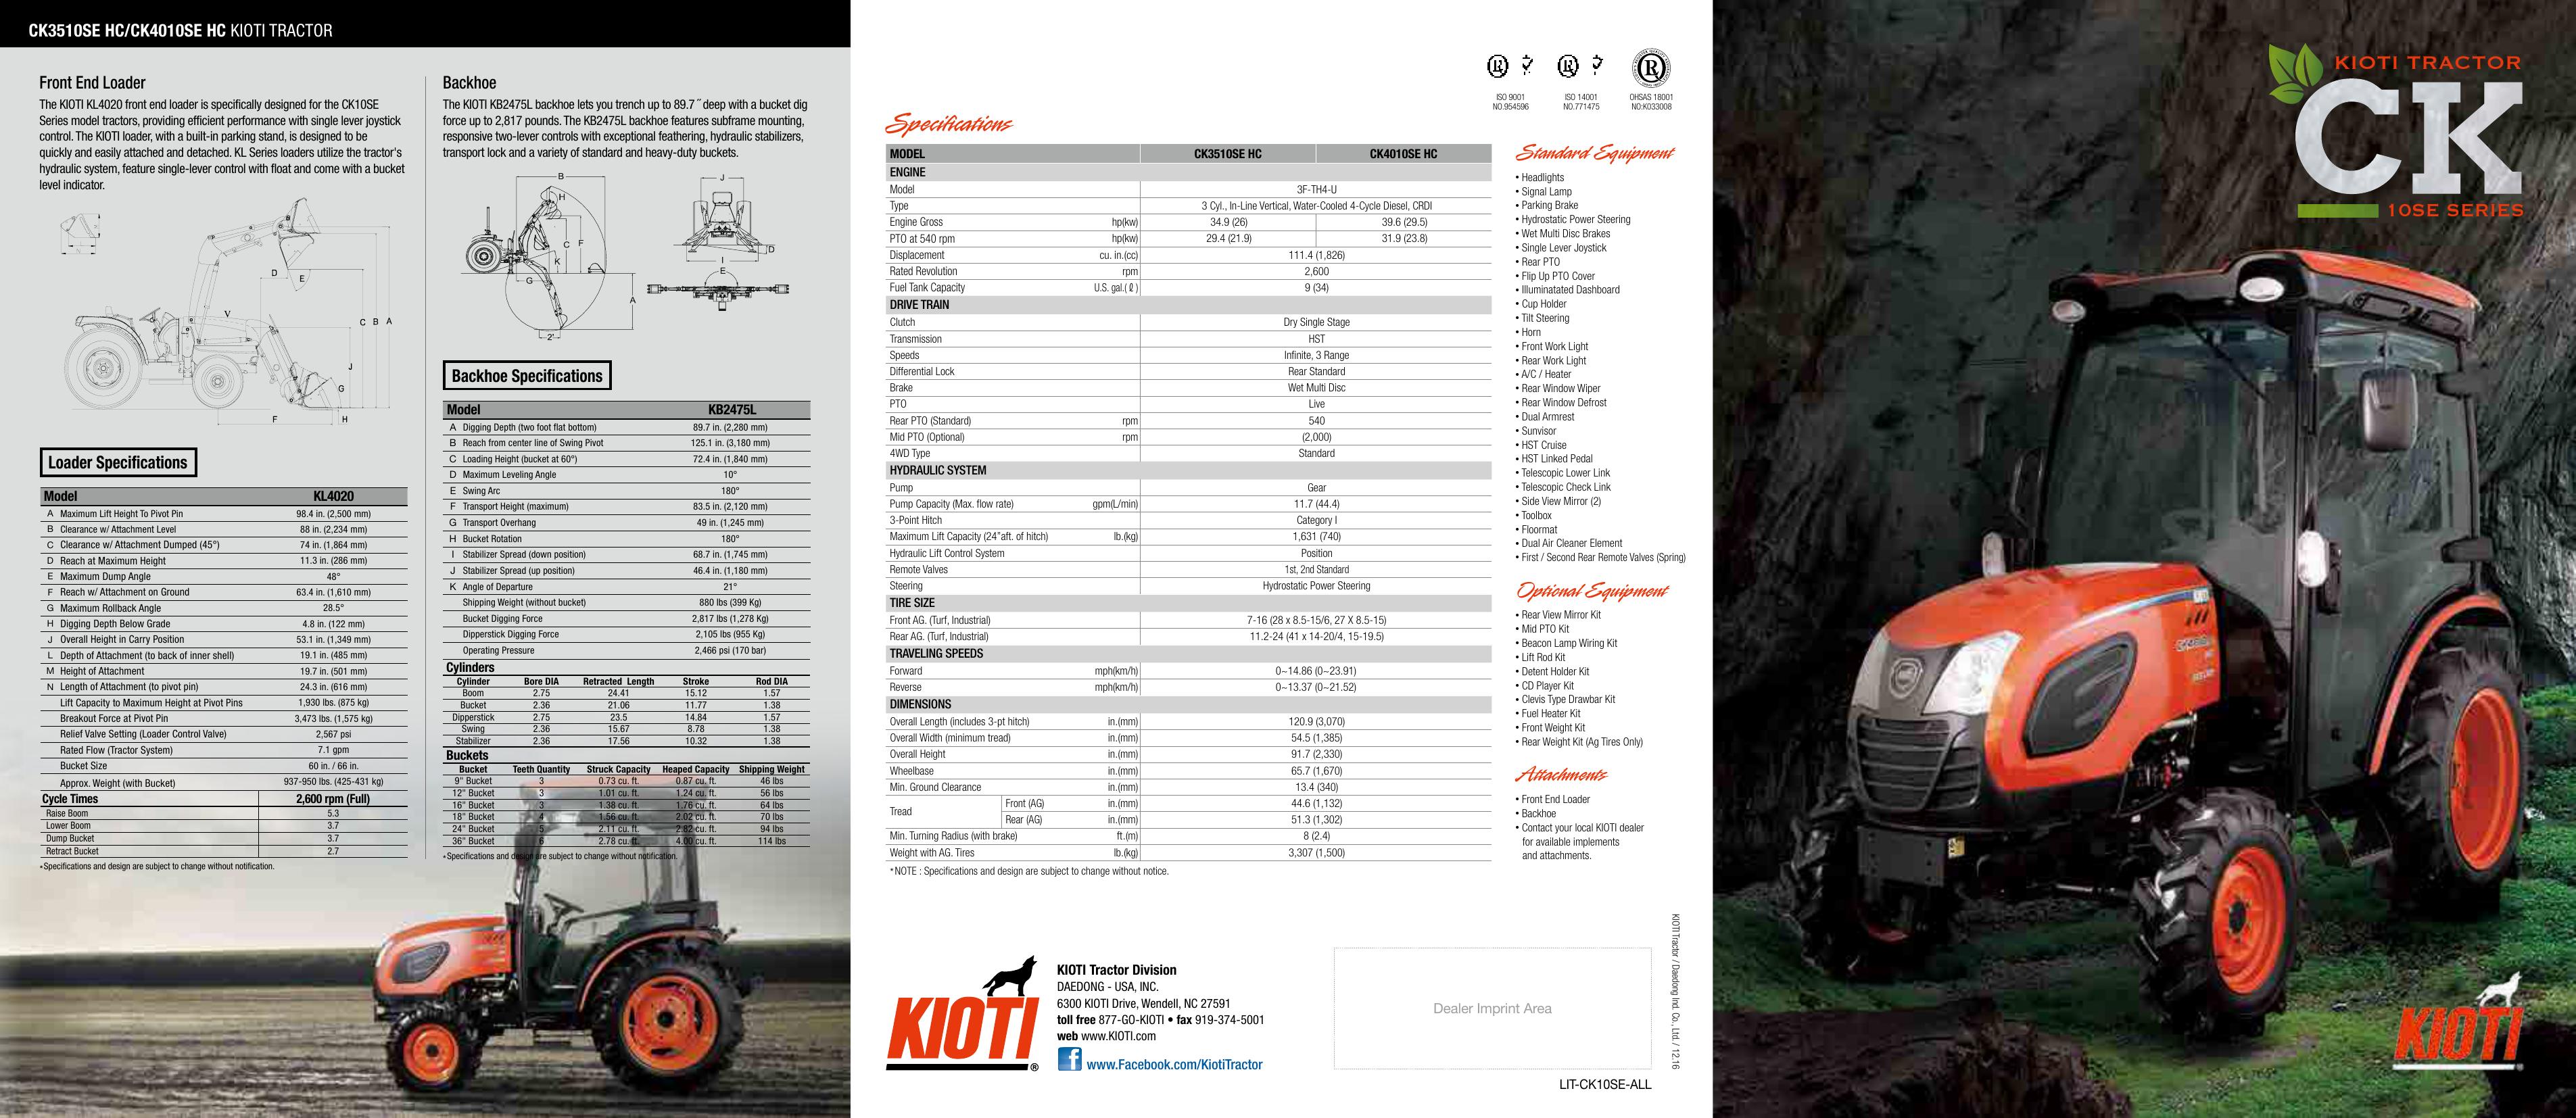 Equipment quipment ts KIOTI TRACTOR | manualzz com